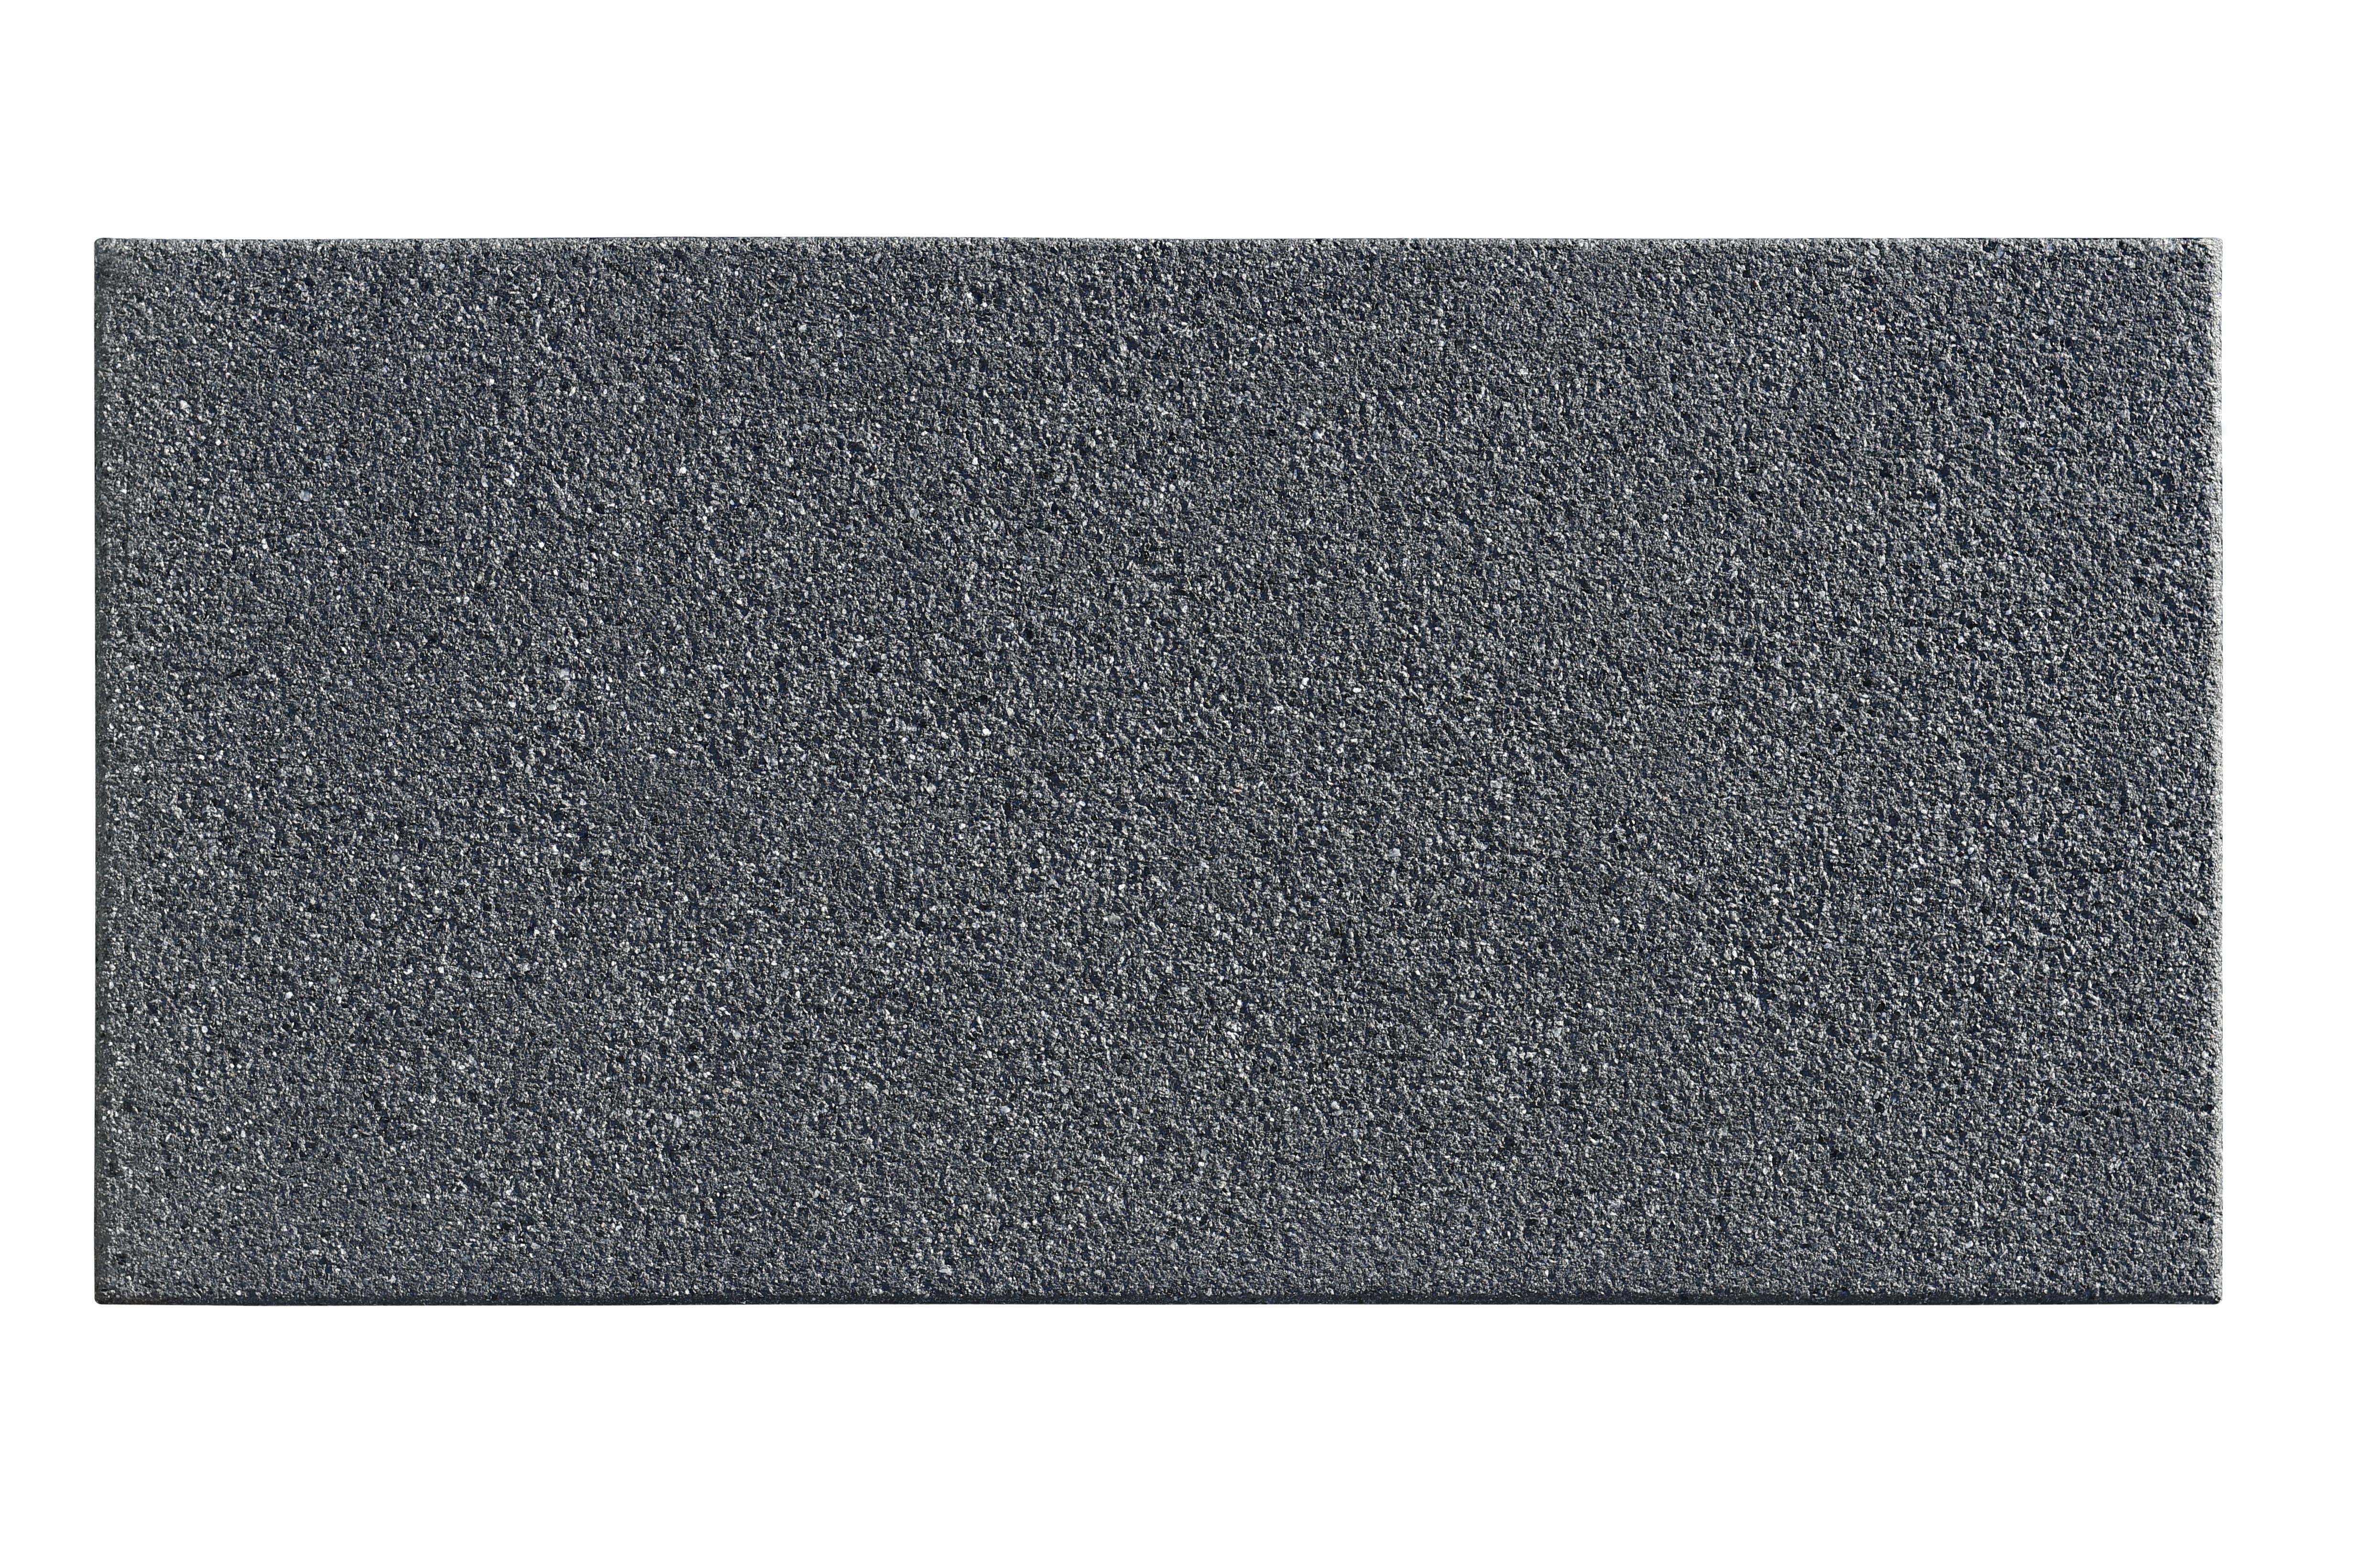 Terrassenplatte Pamplona Sandgestrahlt 800x400x42 Mm Anthrazit